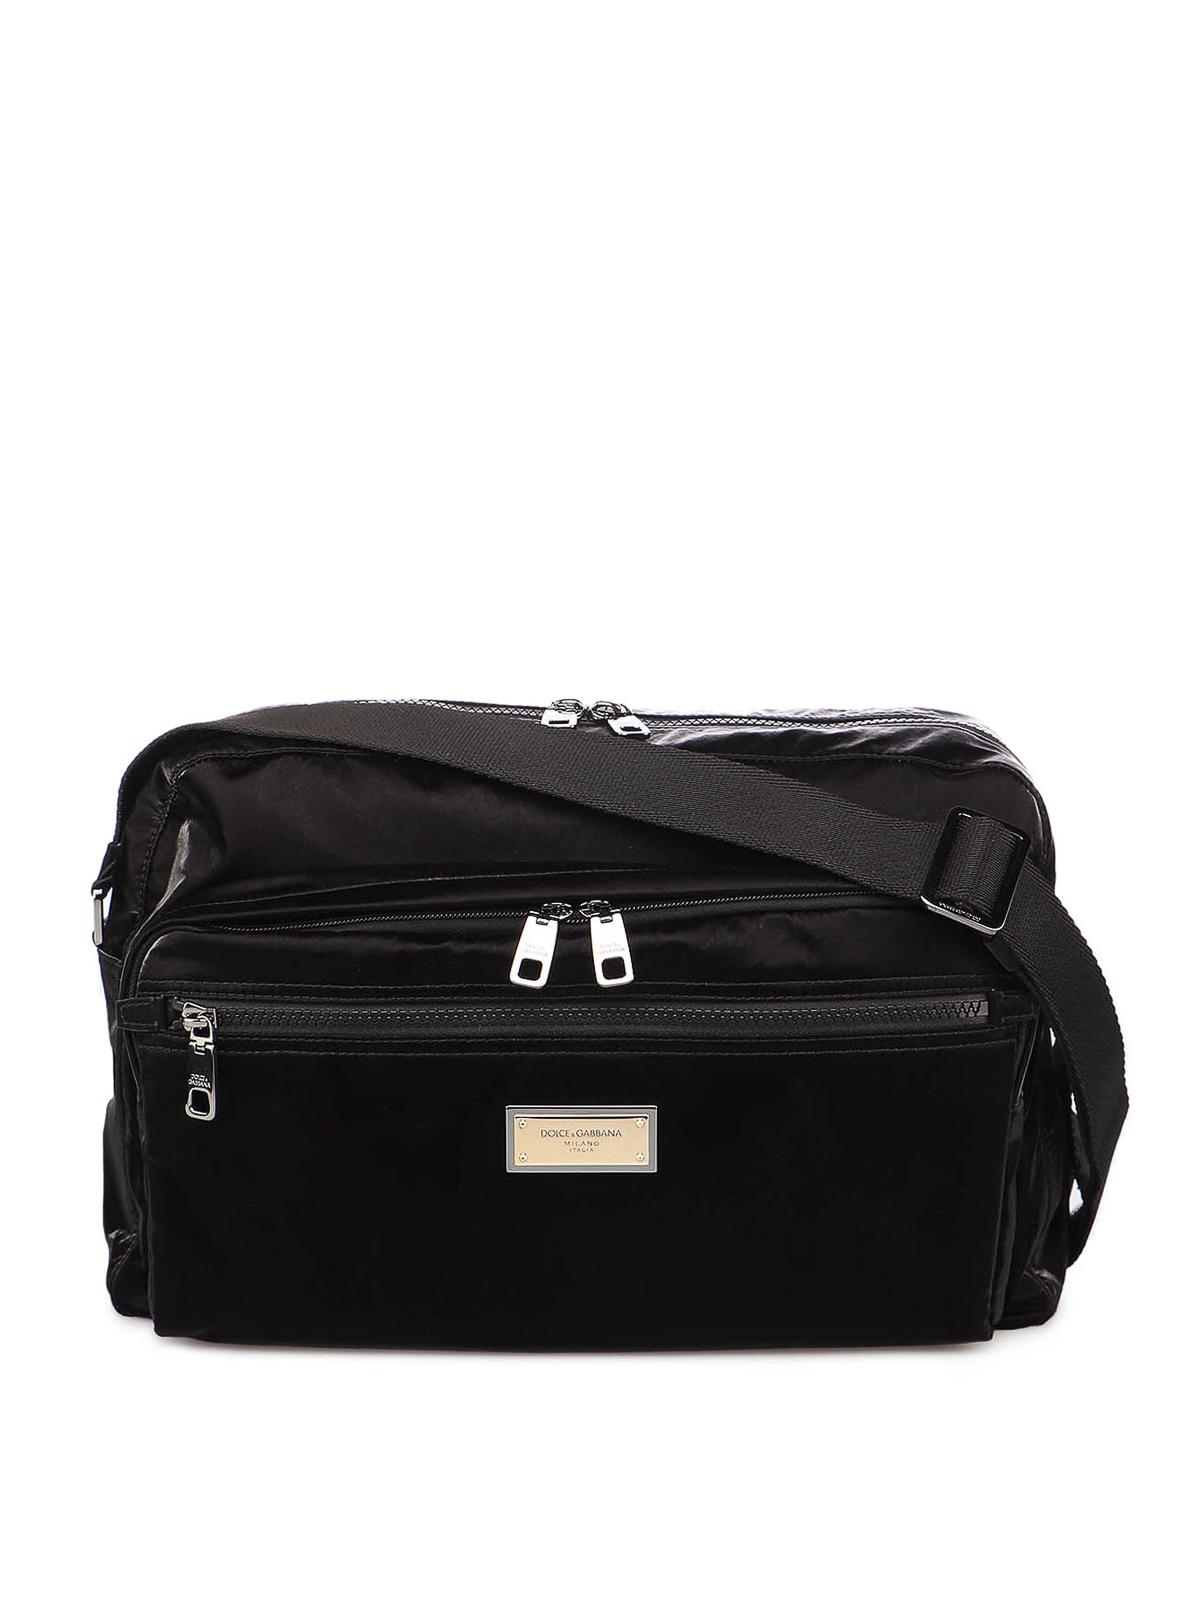 Dolce & Gabbana Bags MESSENGER BAG SICILIA